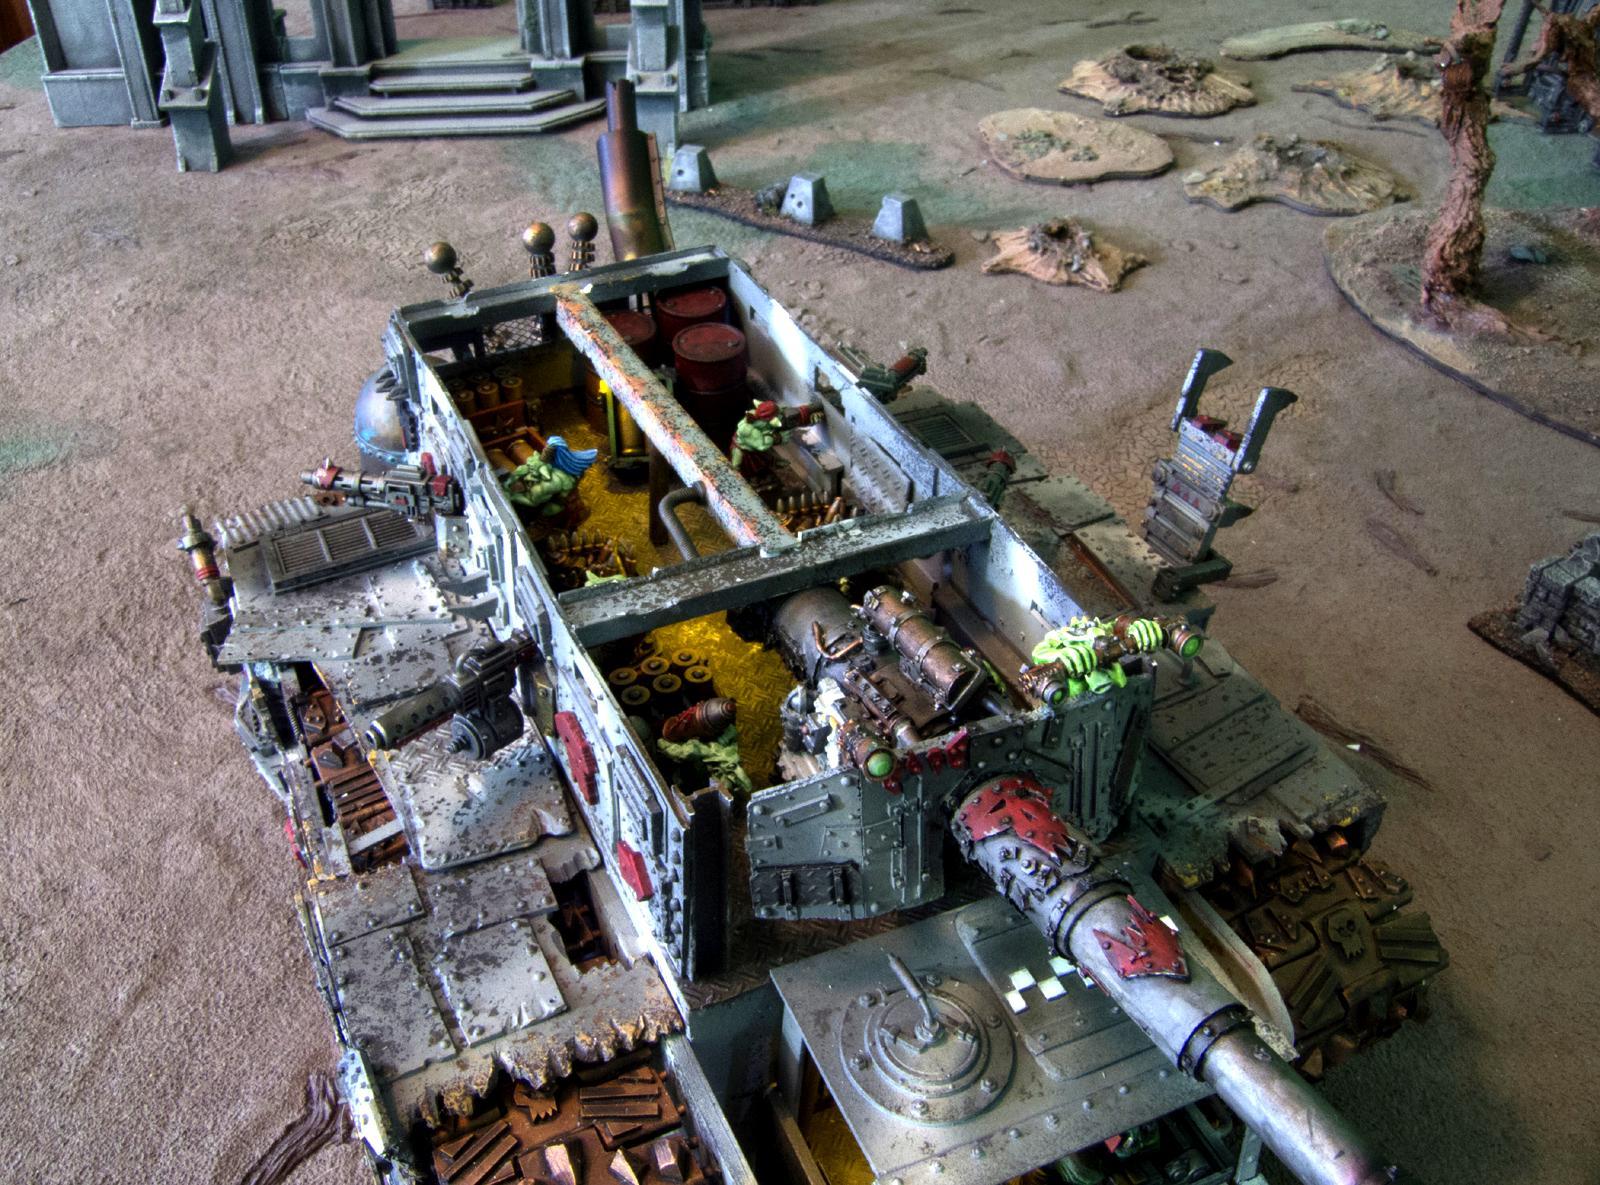 Battle Fortress, Orks, Ouze, Scratch Build, Super-heavy, Warhammer 40,000